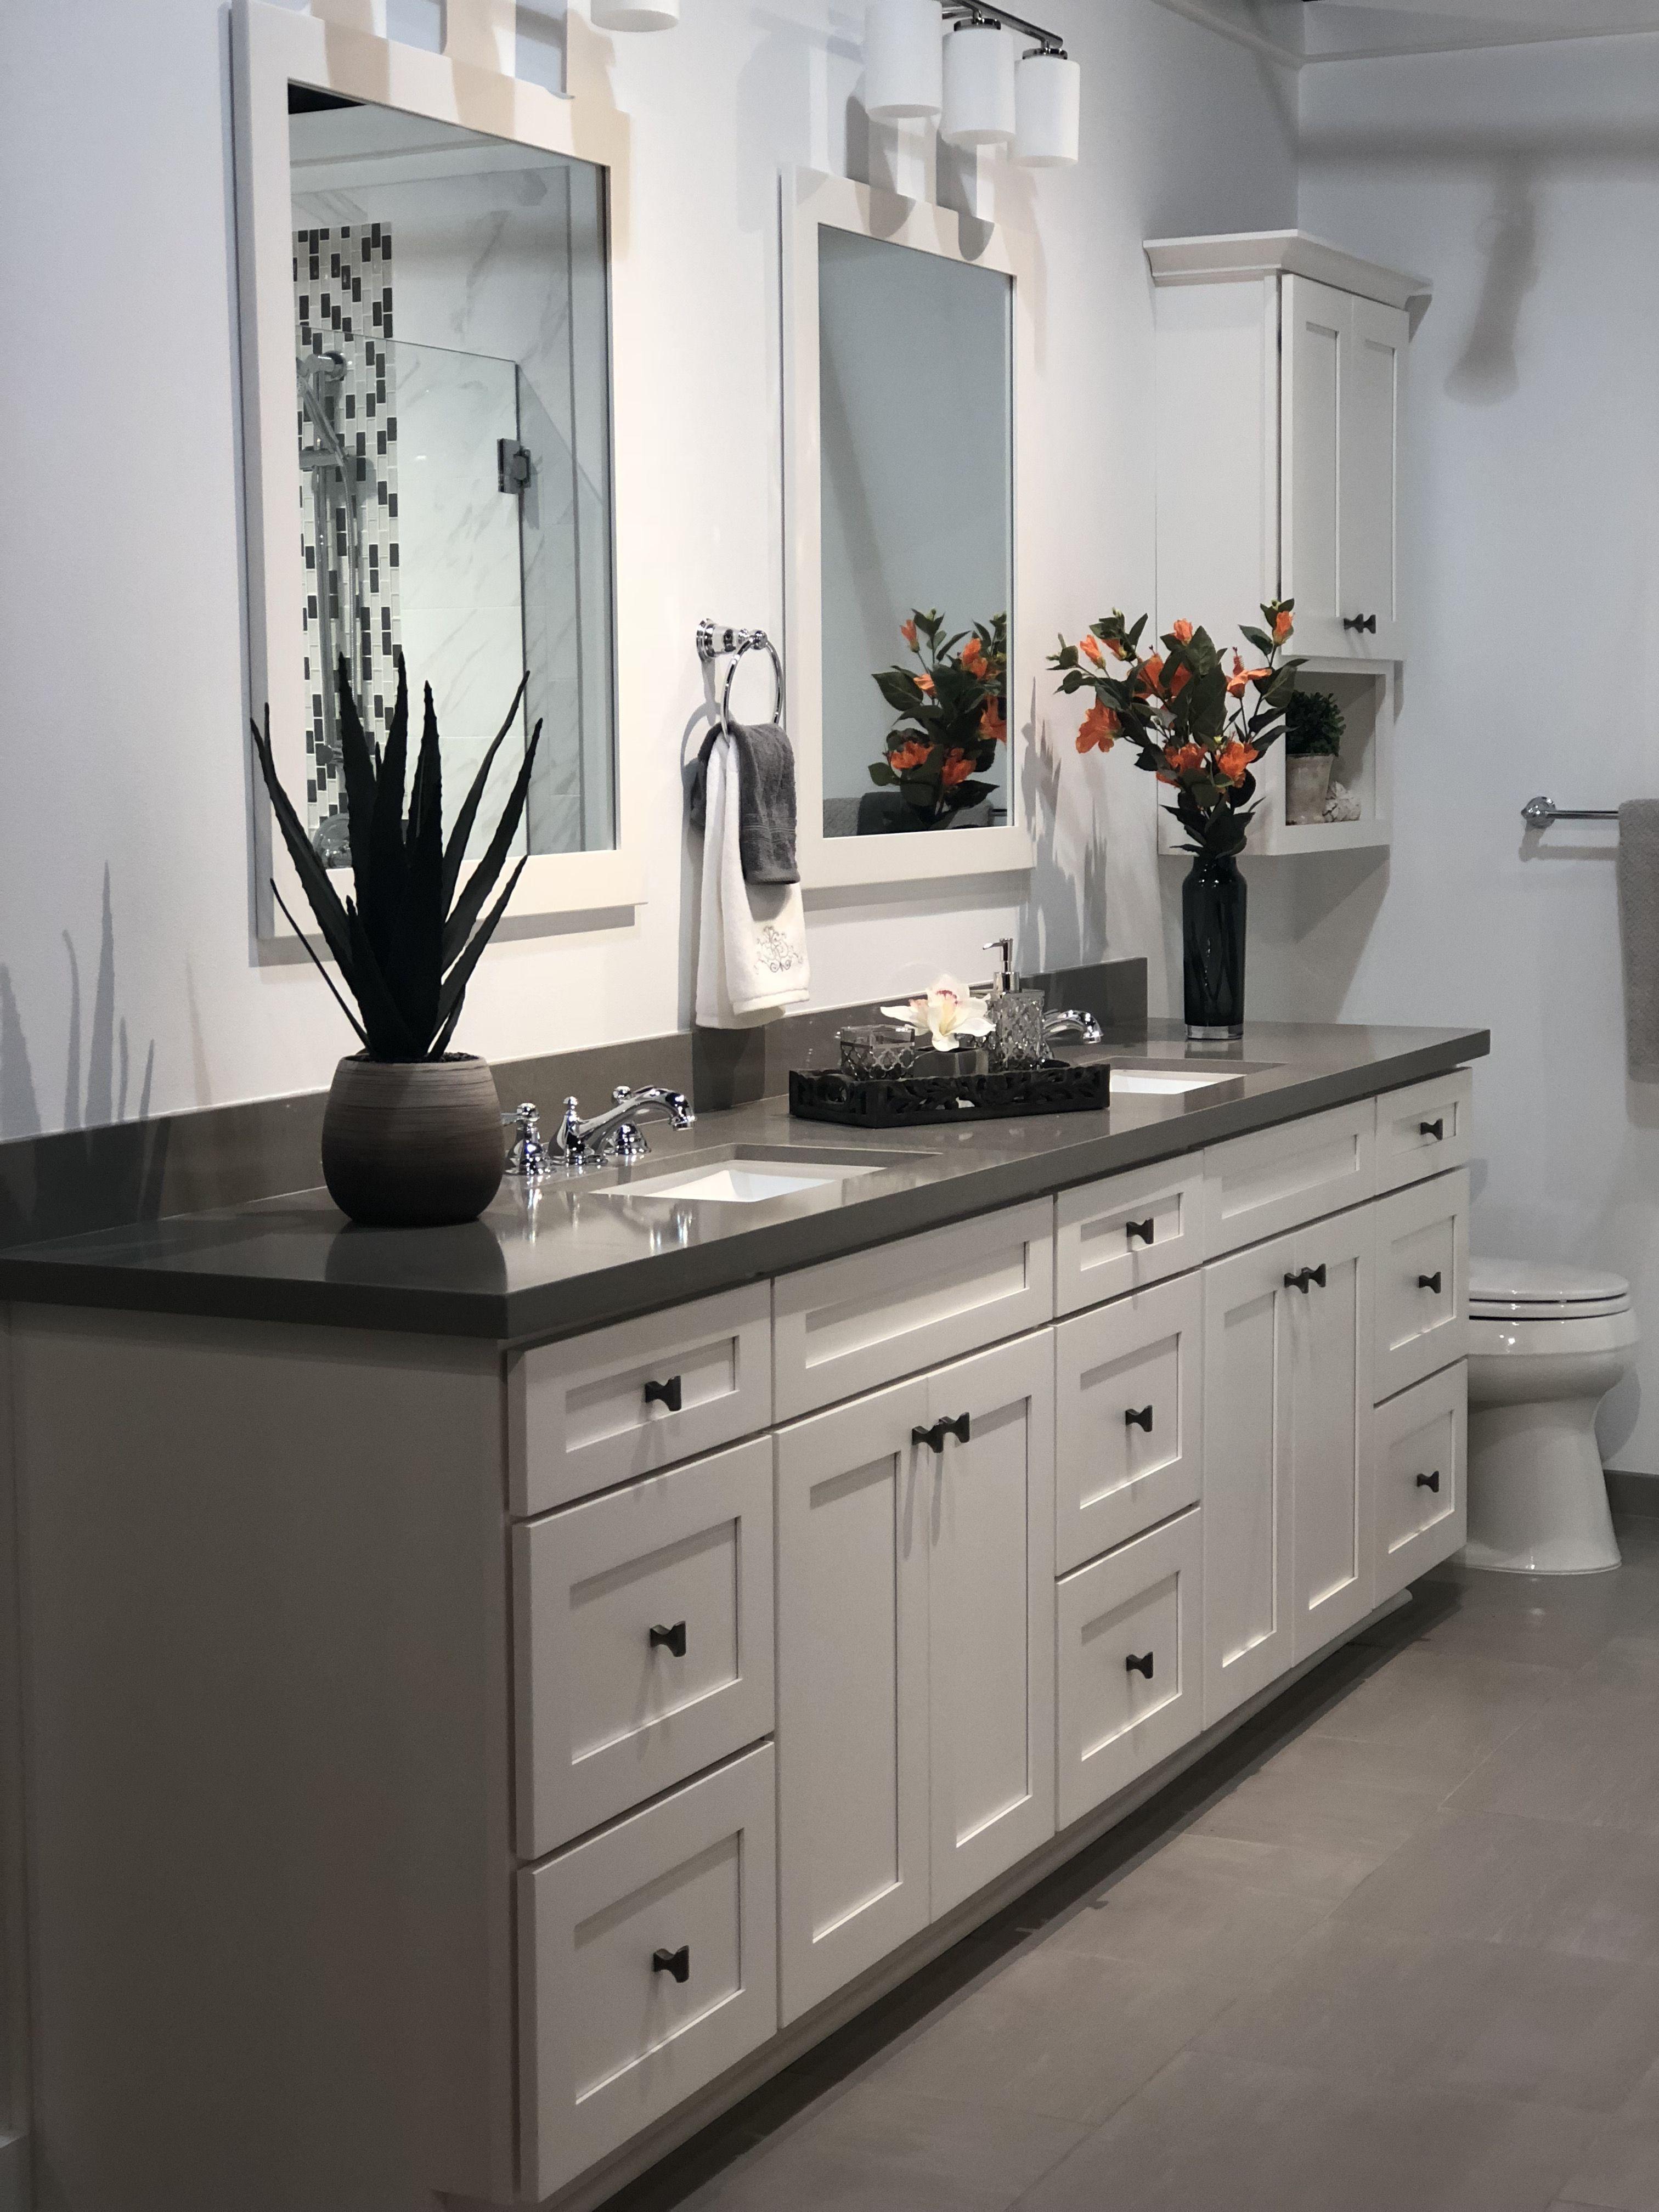 Top 10 Double Bathroom Vanity Design Ideas In 2019 Double Vanity Bathroom Grey Countertops Bathroom Vanity Designs